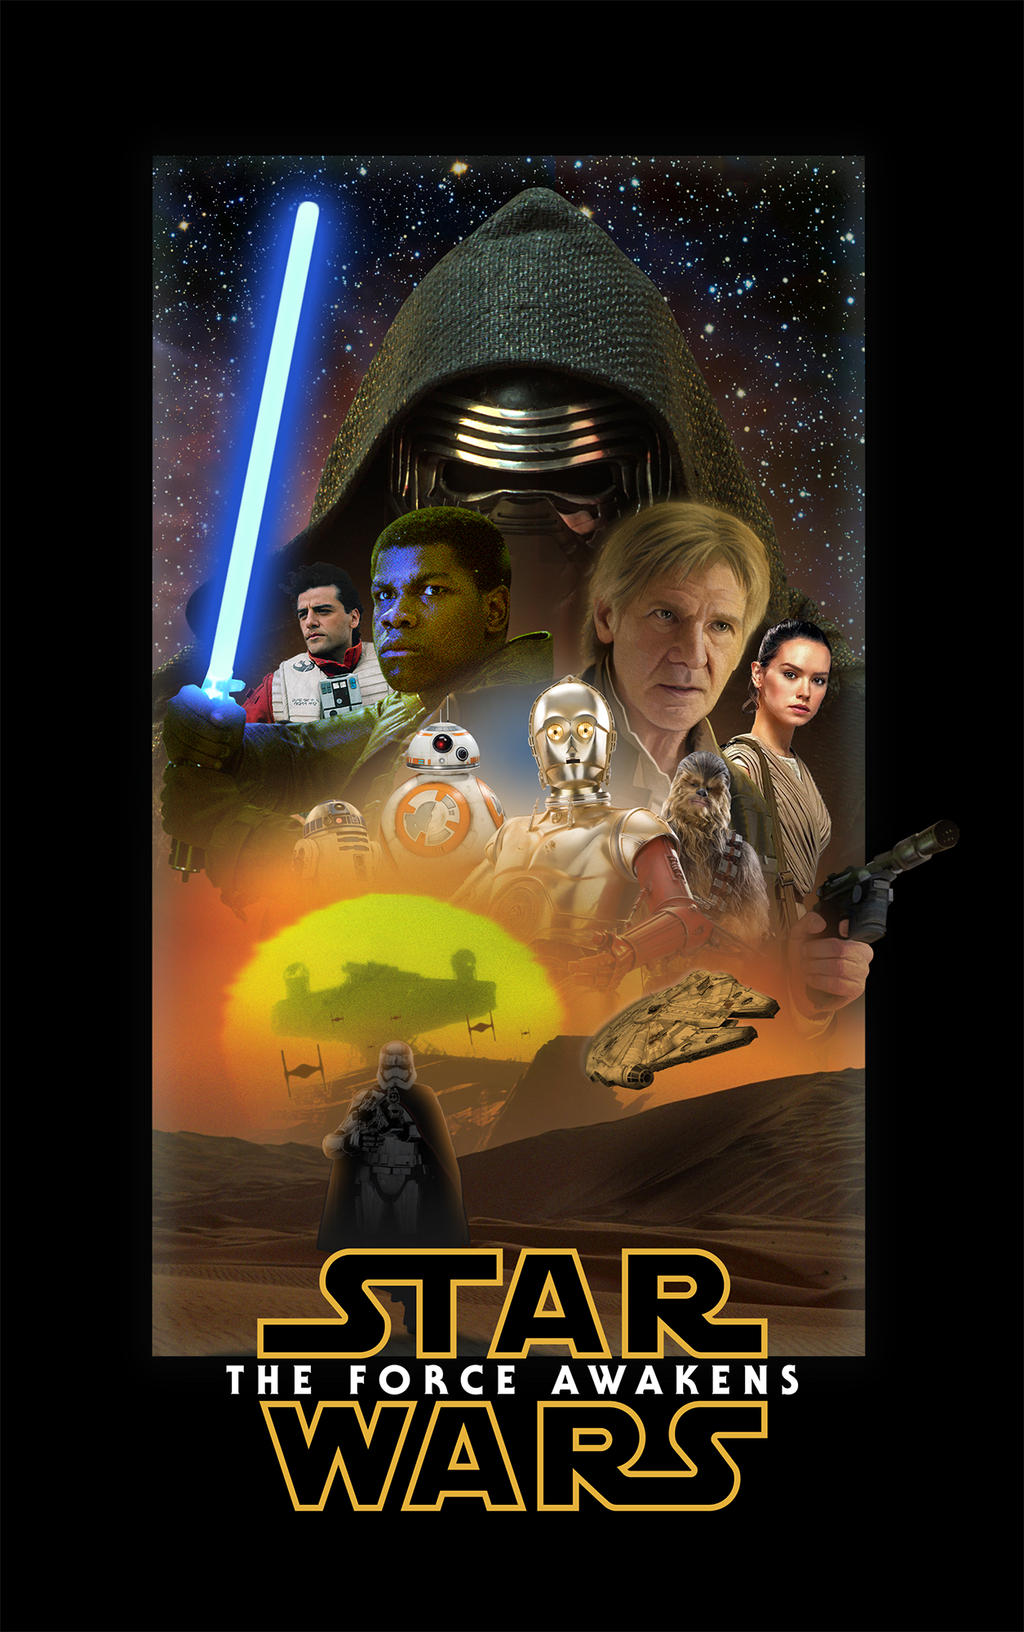 Star Wars The Force Awakens Poster by dan-zhbanov